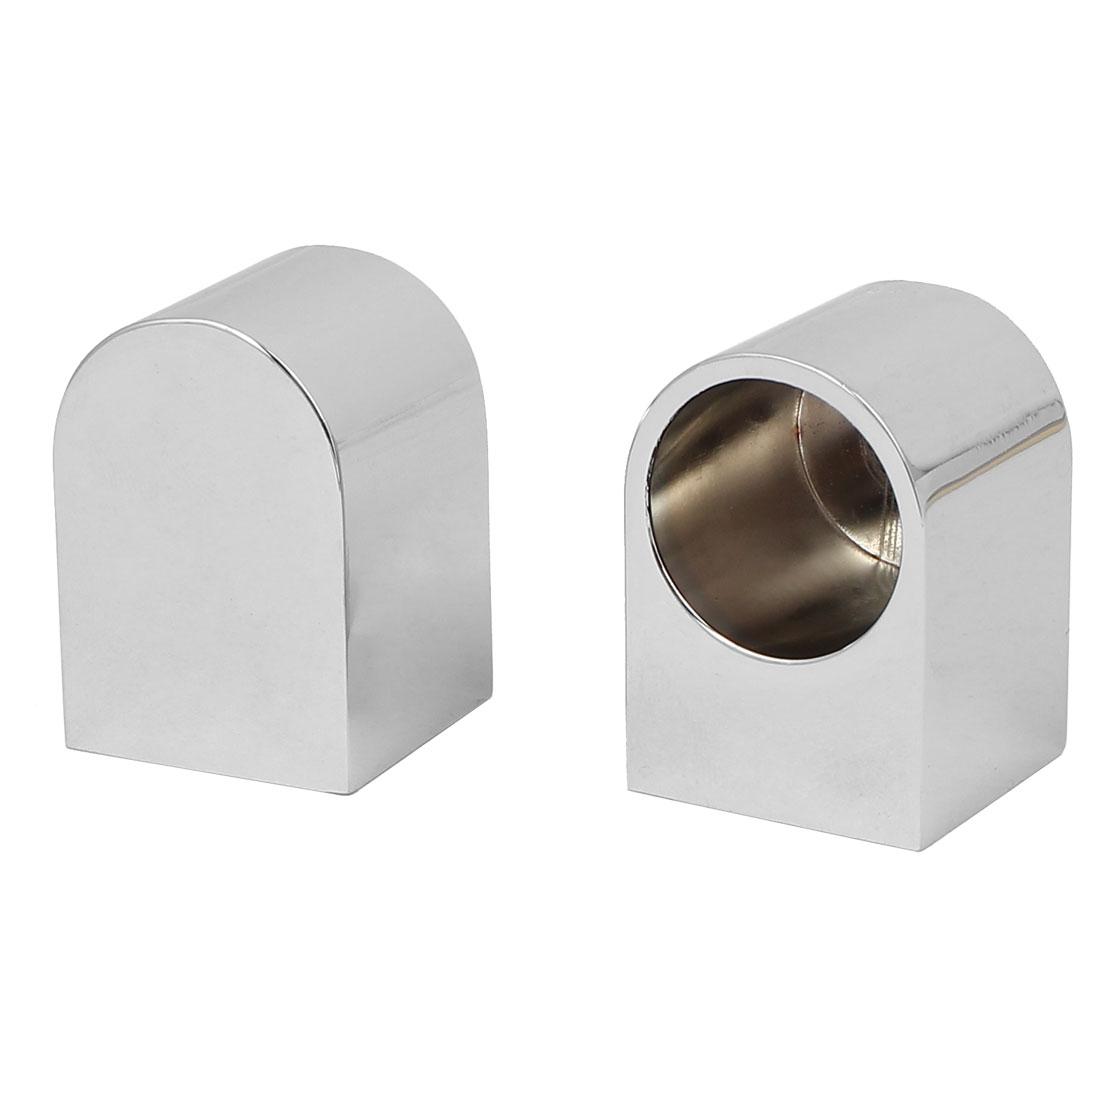 Wardrobe Closet Rail Rod End Bracket Support Silver Tone 19mm Dia 2pcs